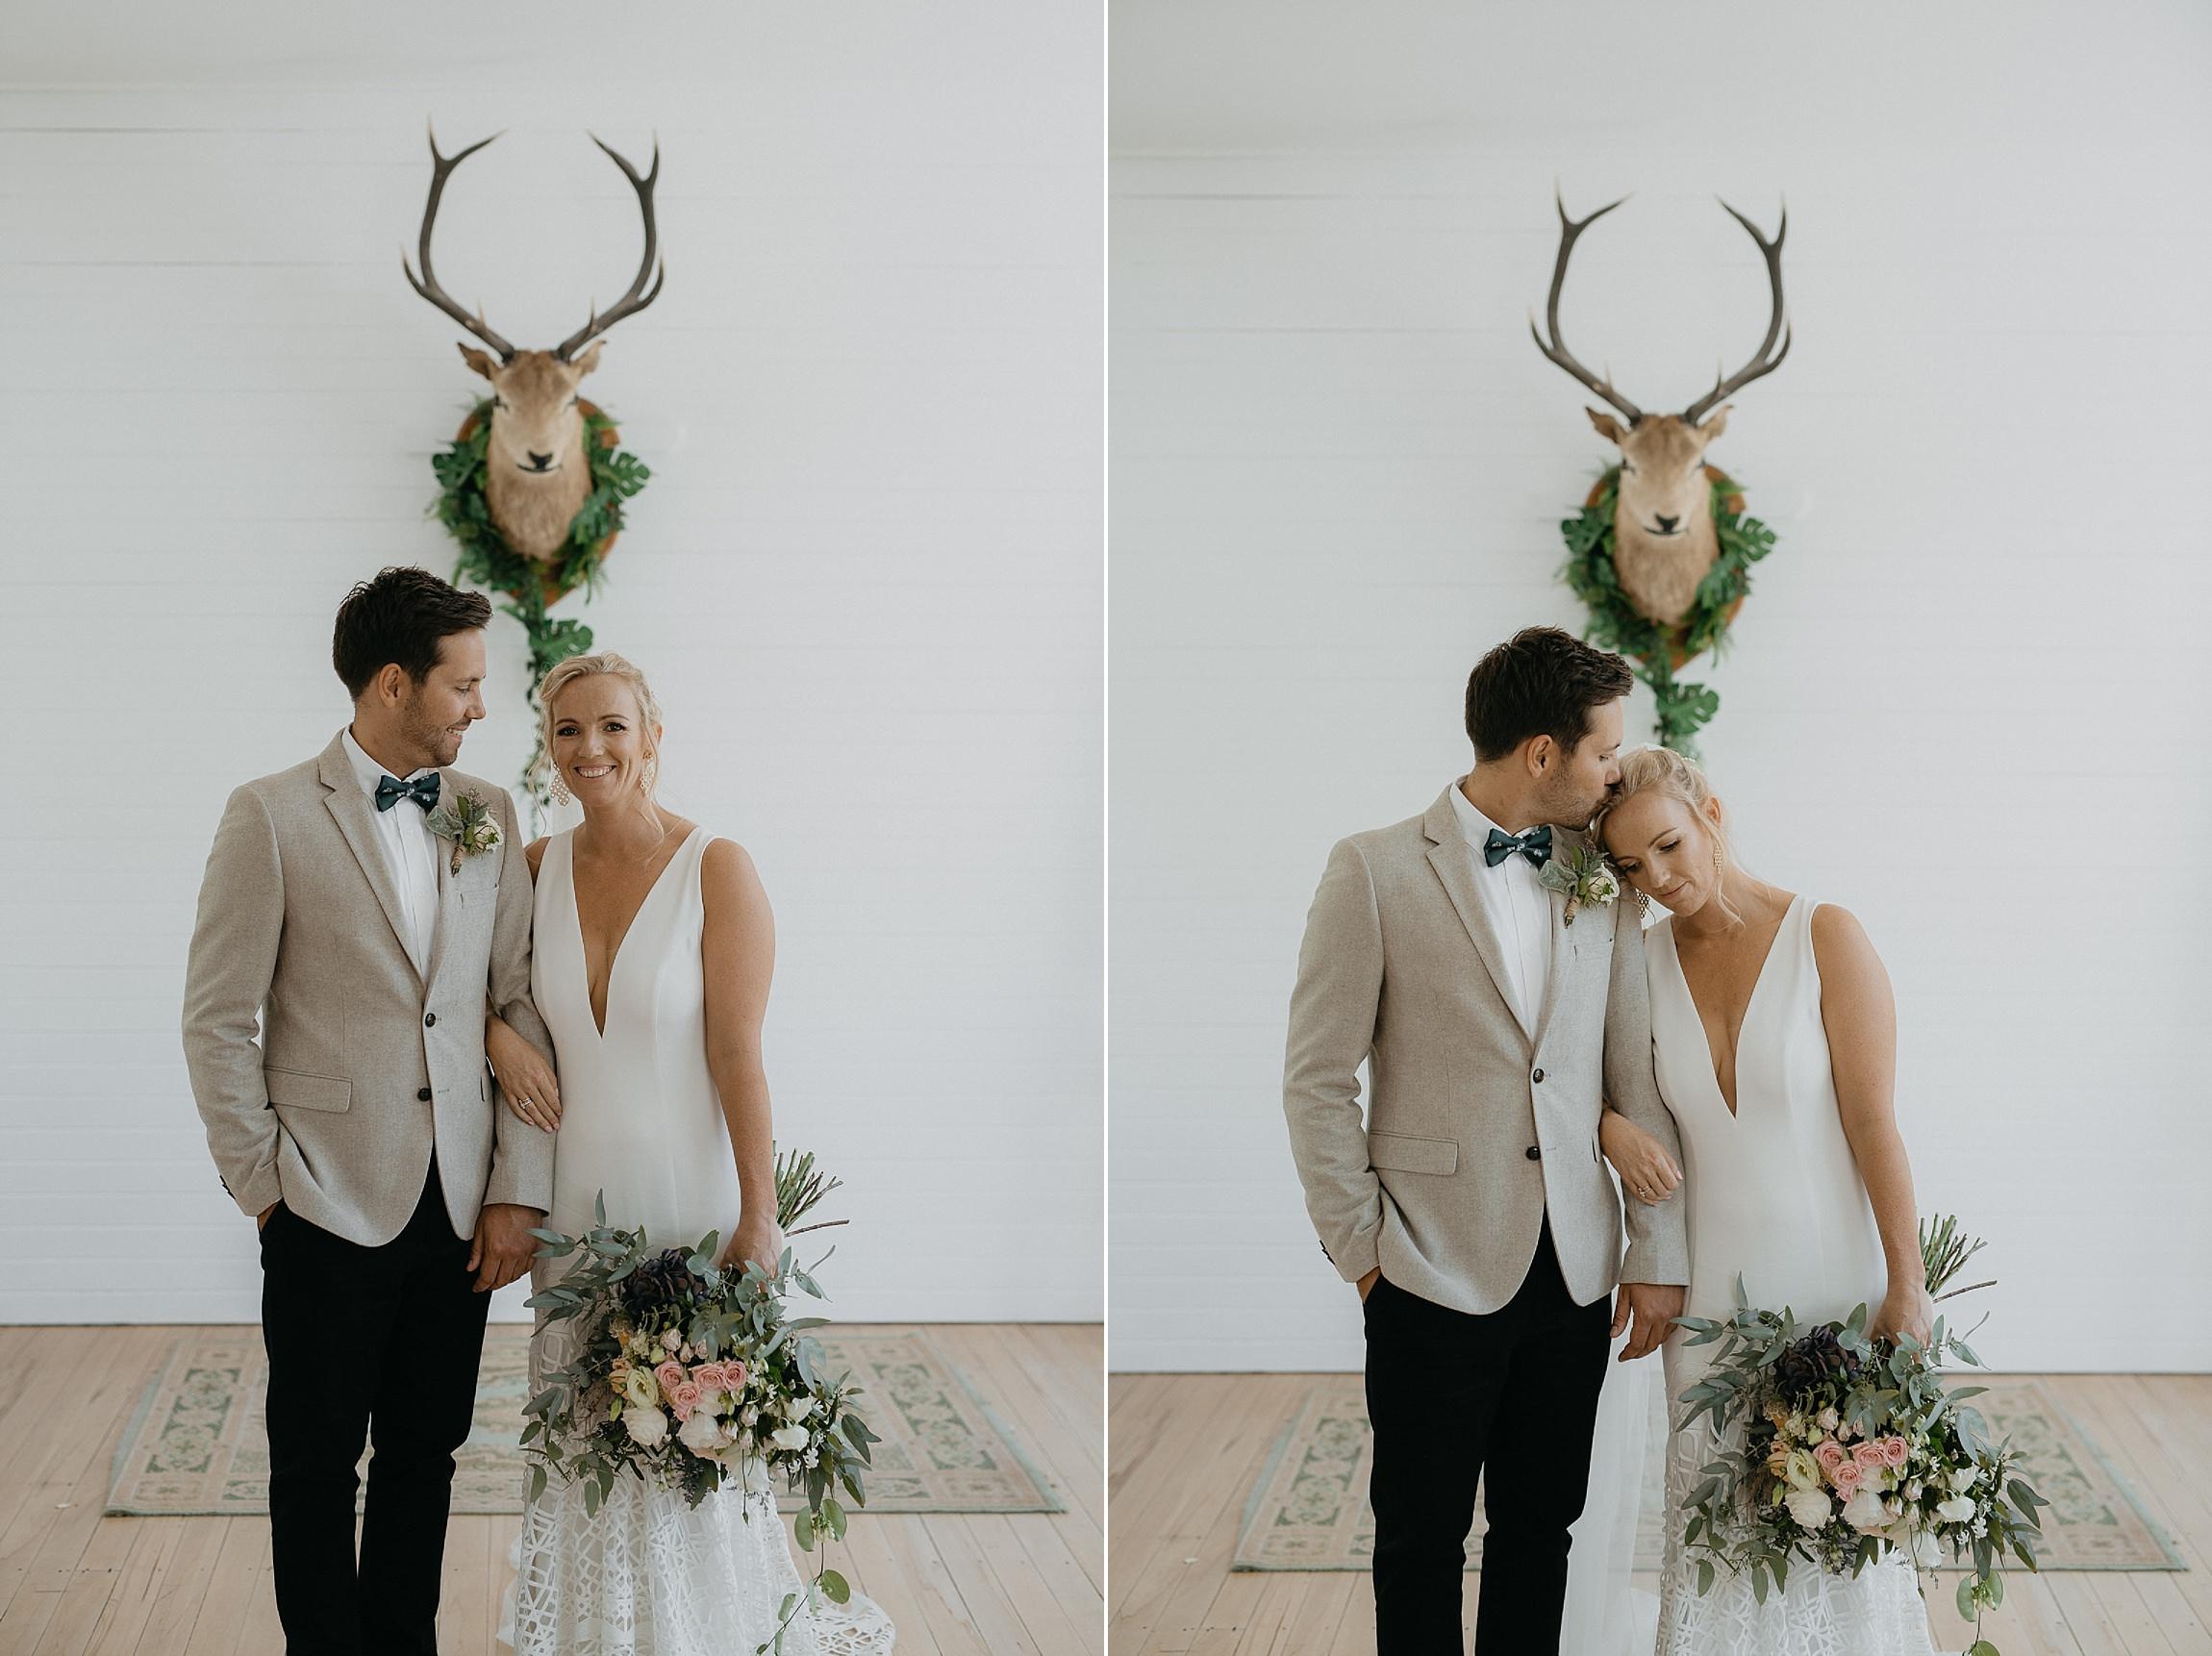 oldforestschool-wedding-blog-65.jpg